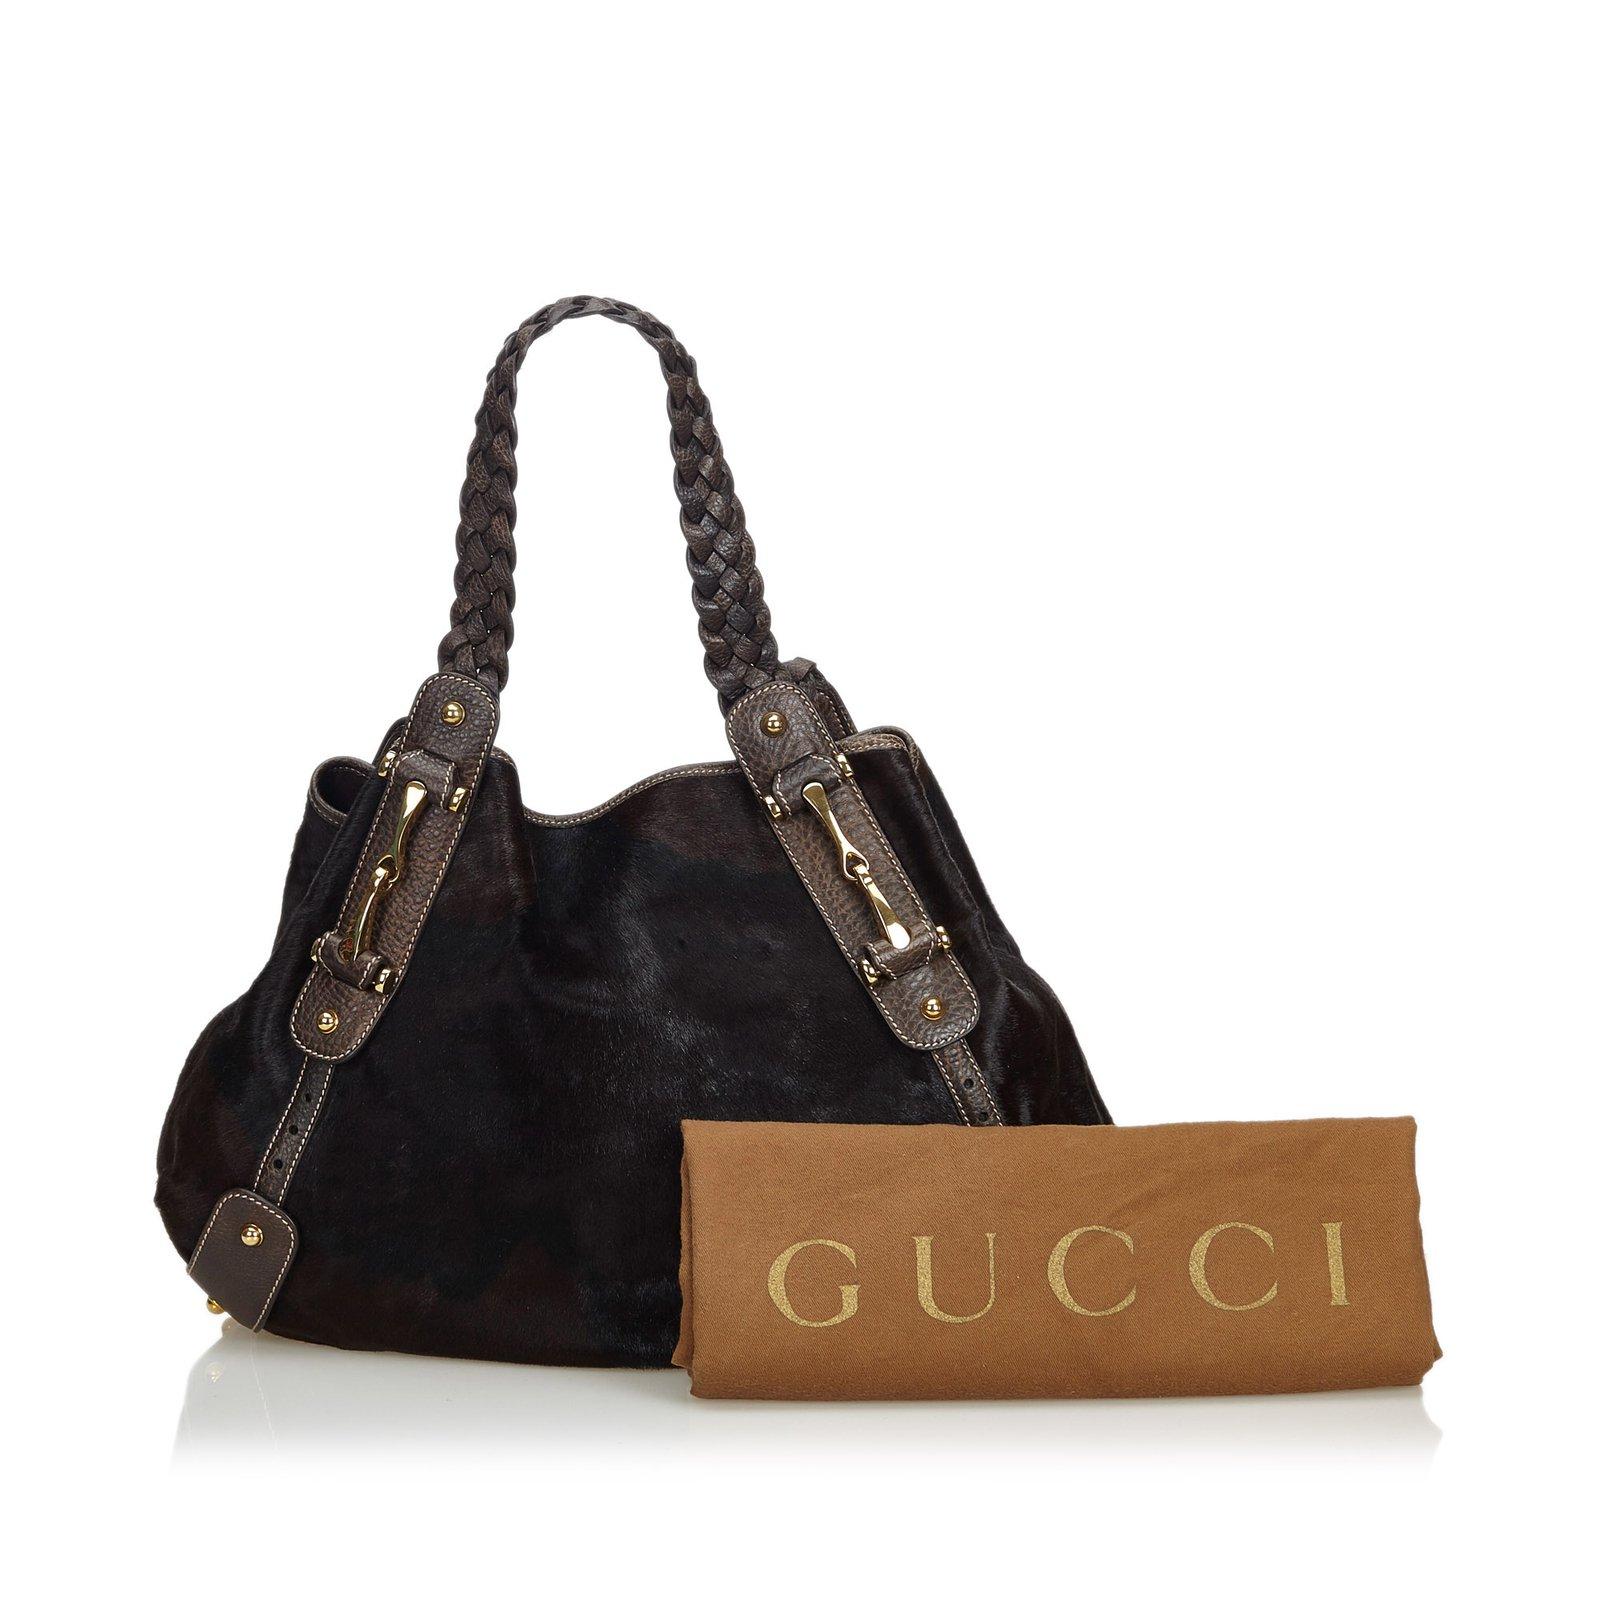 7a76c382010 Gucci Horsebit Pony Hair Pelham Tote Bag Totes Leather